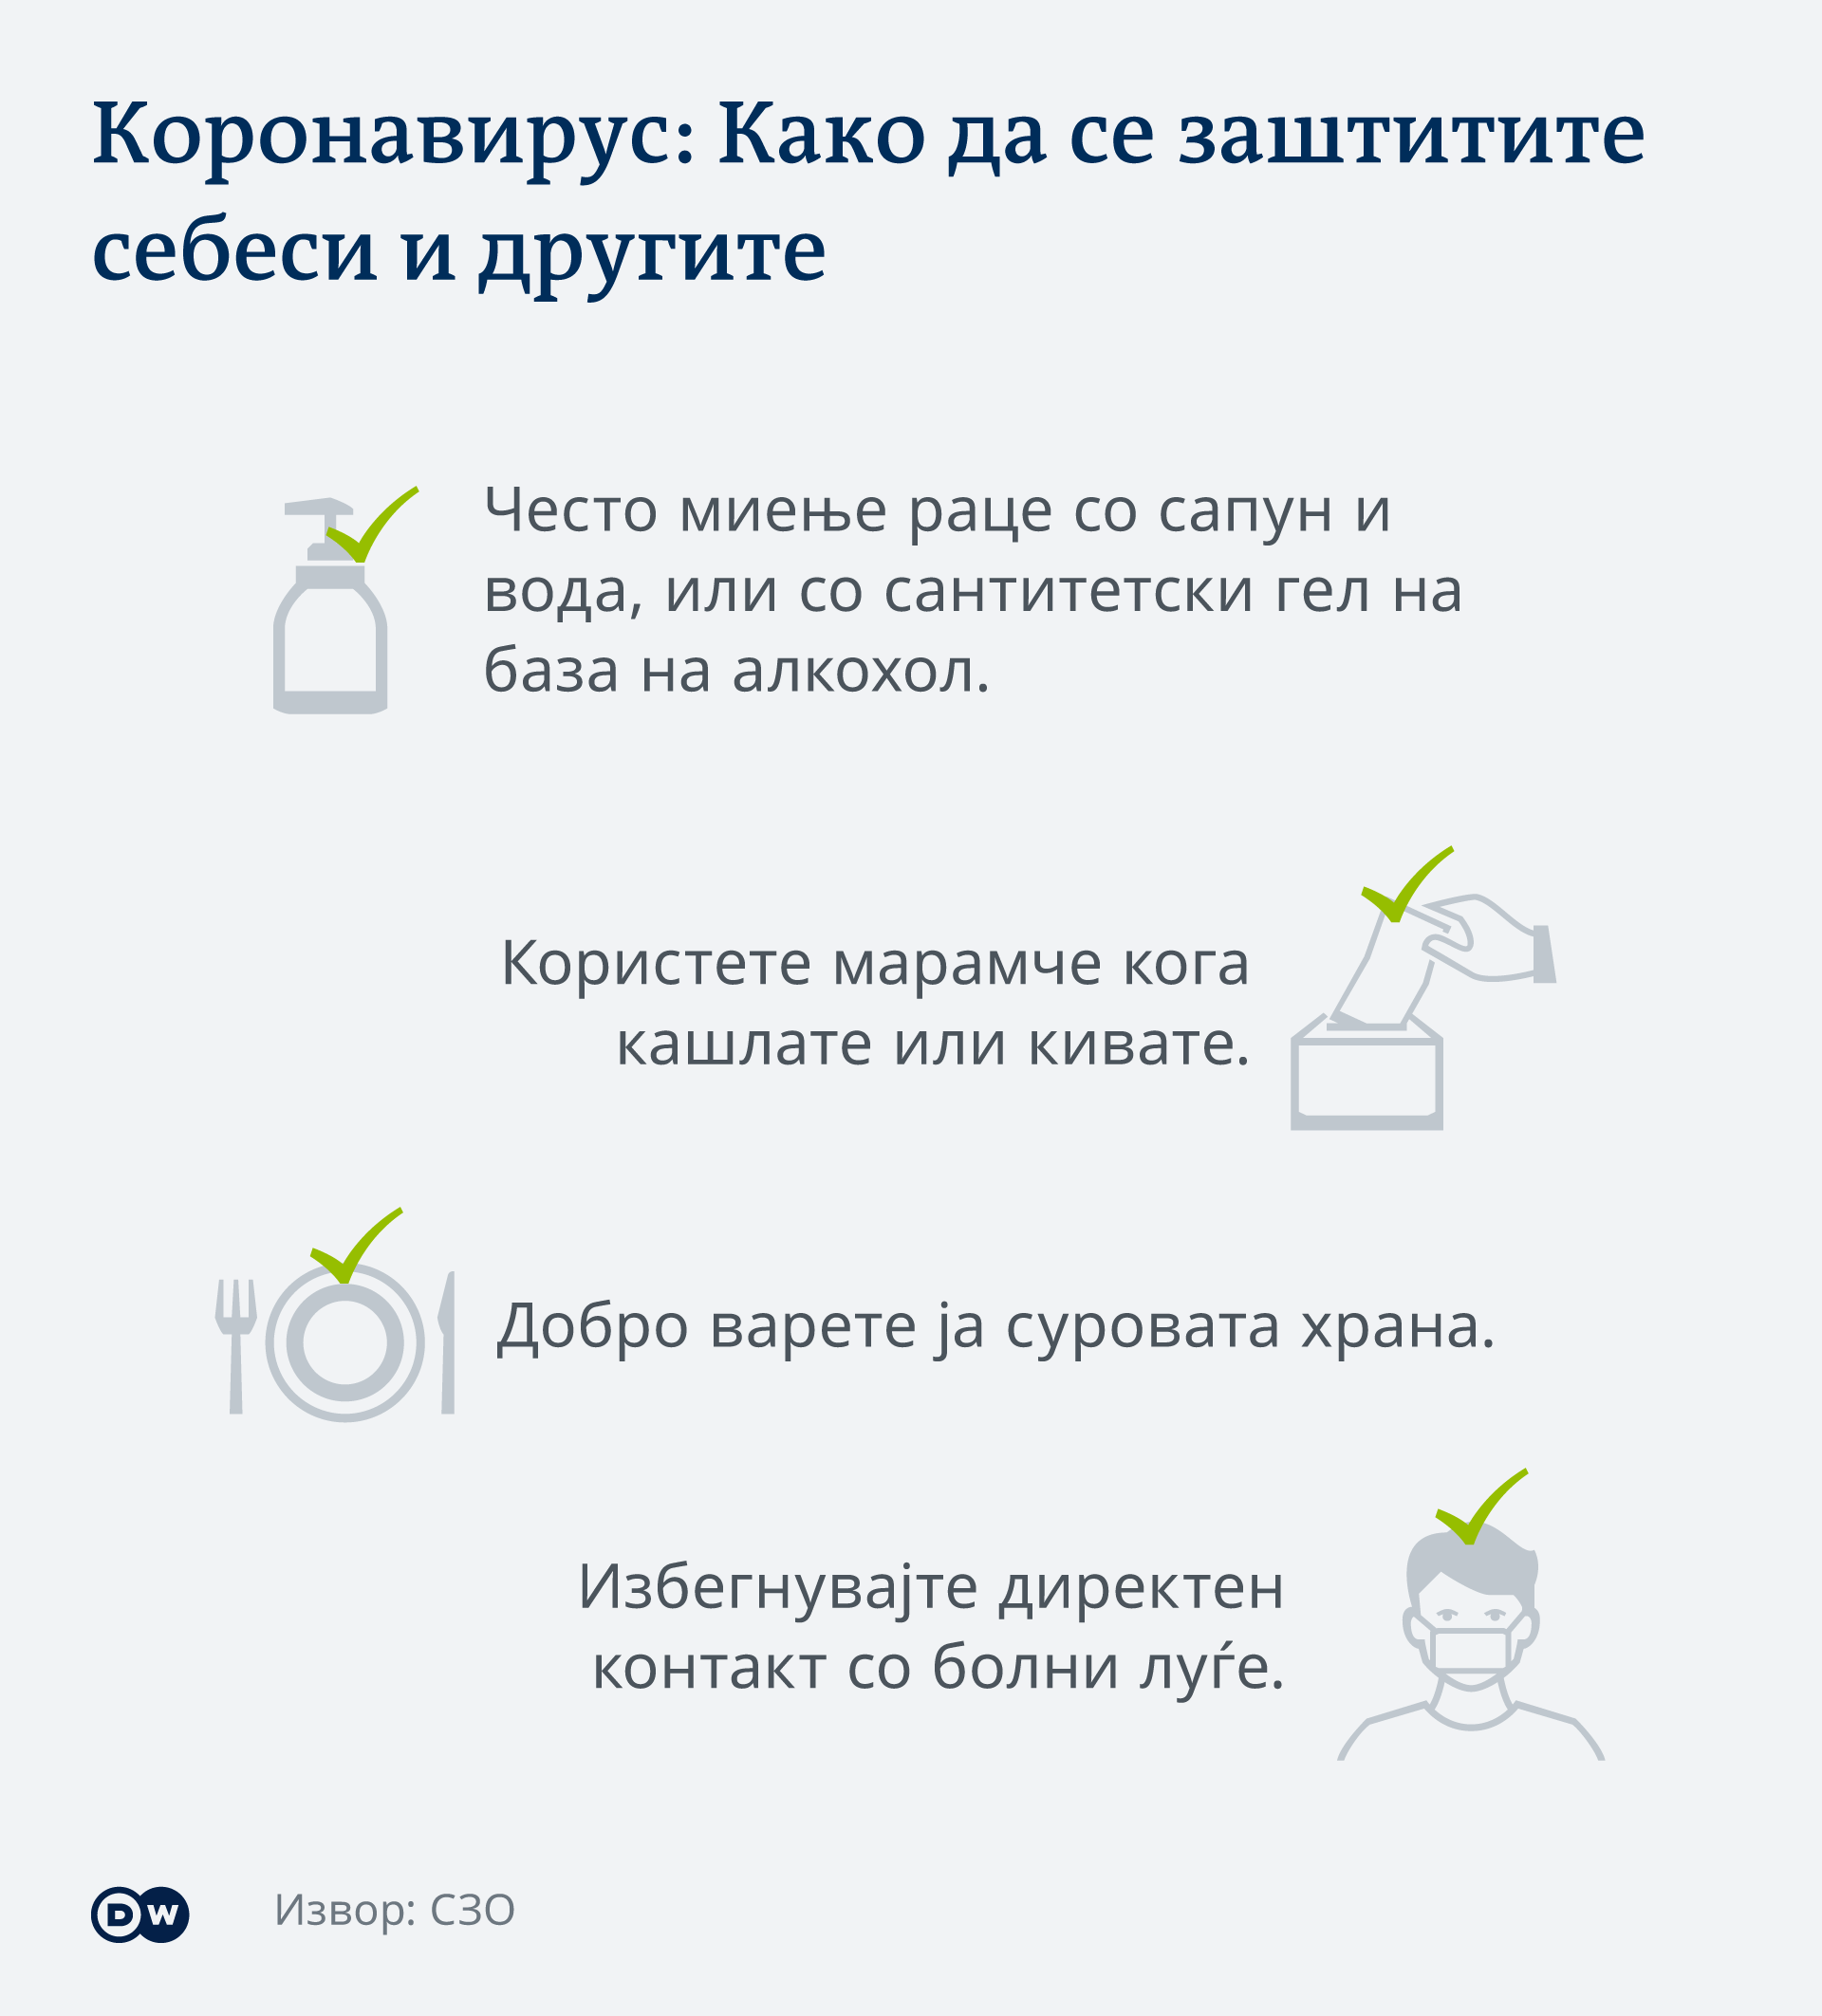 Infografik Coronavirus: Ways to protect yourself and others MK